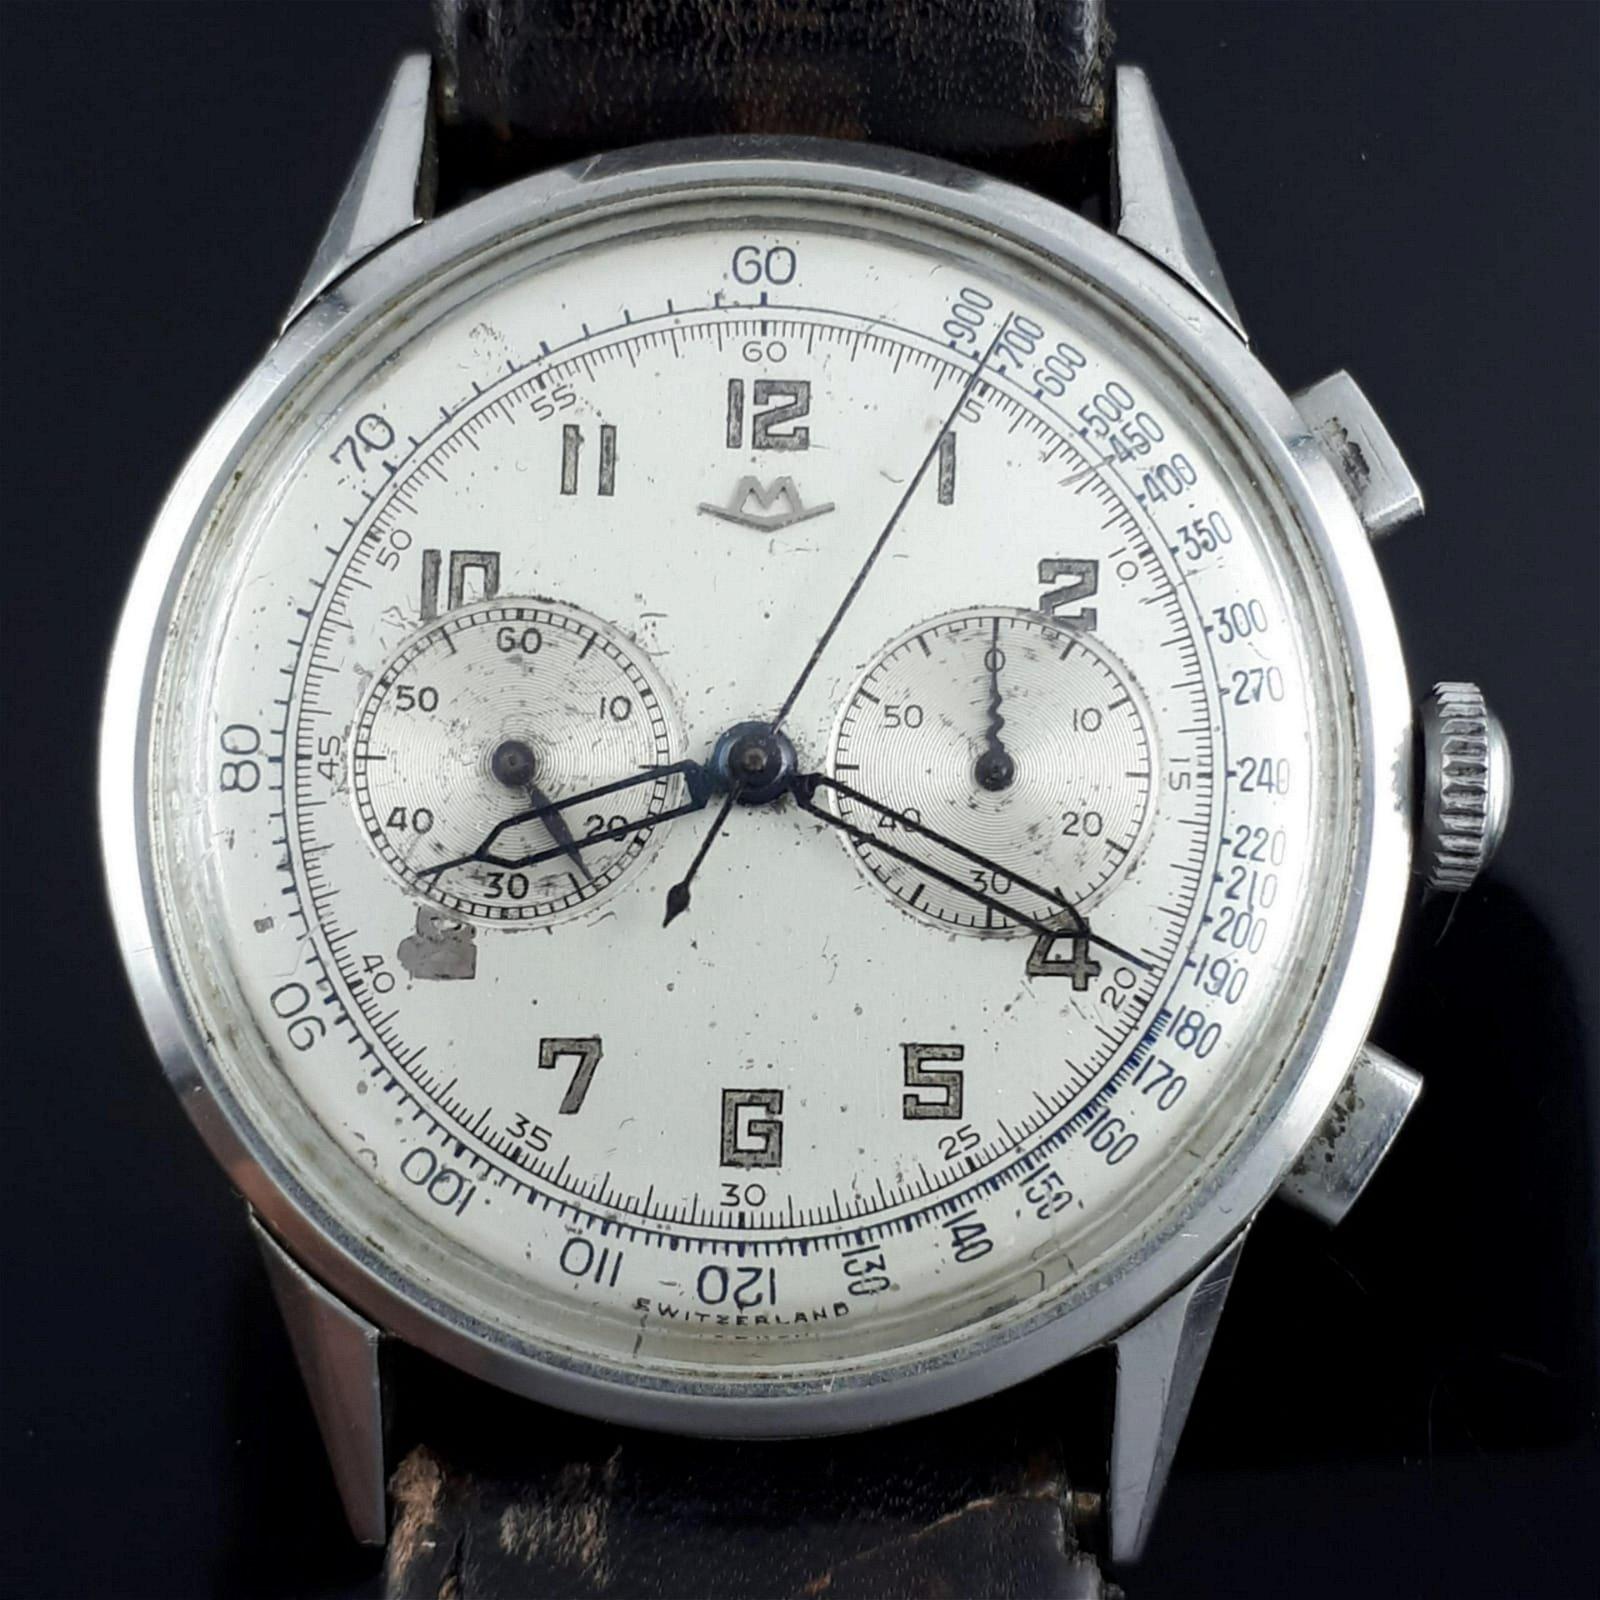 Movado - Vintage Chronographe - Men - 1901-1949